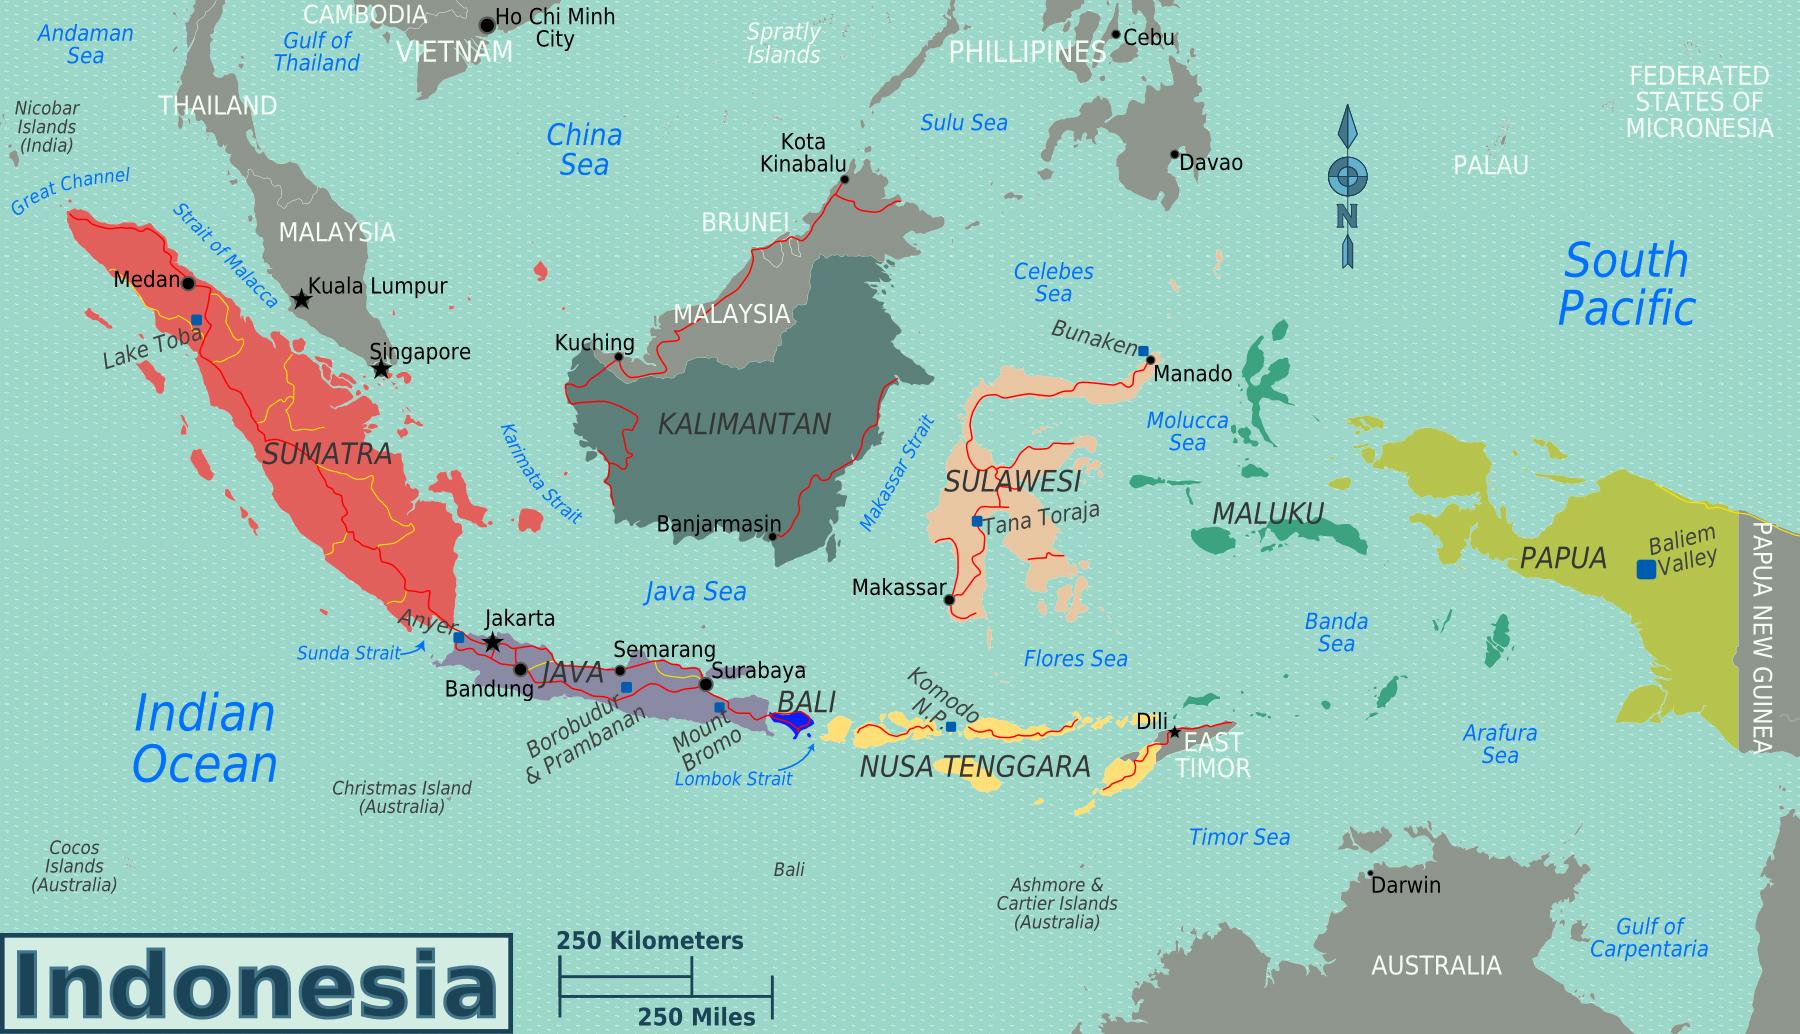 large-regions-map-of-indonesia.jpg